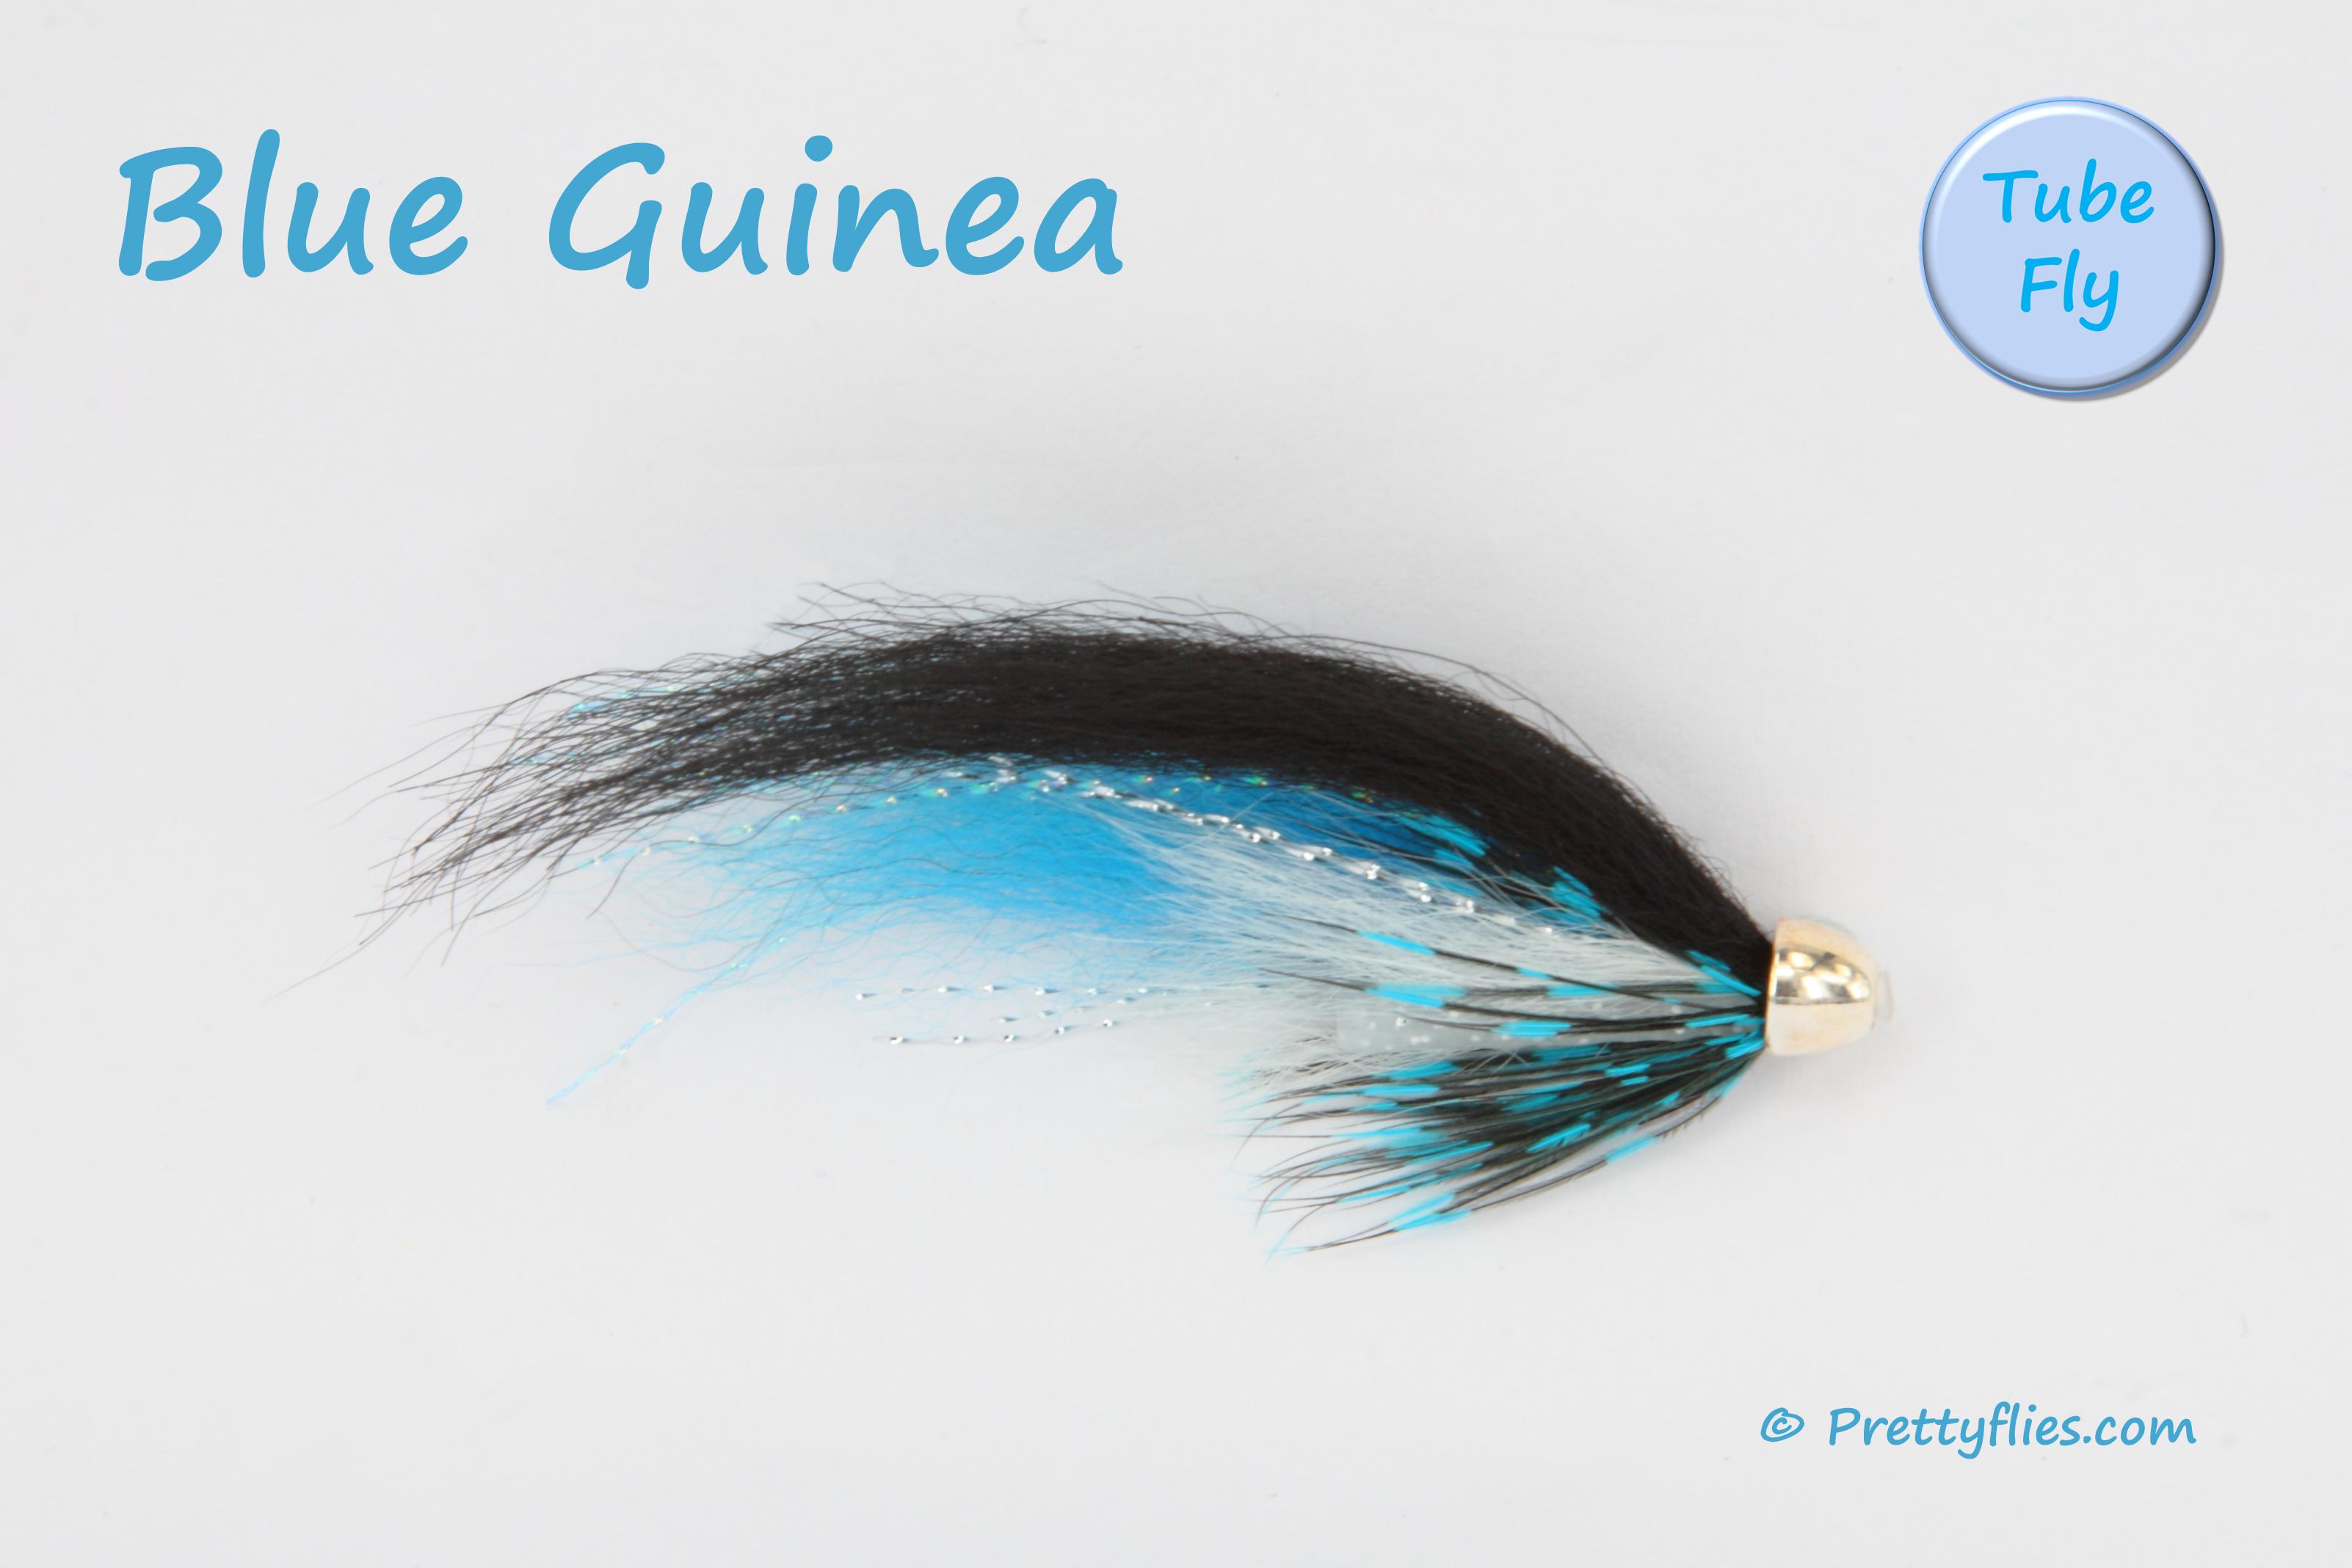 Blue Guinea copy.jpg